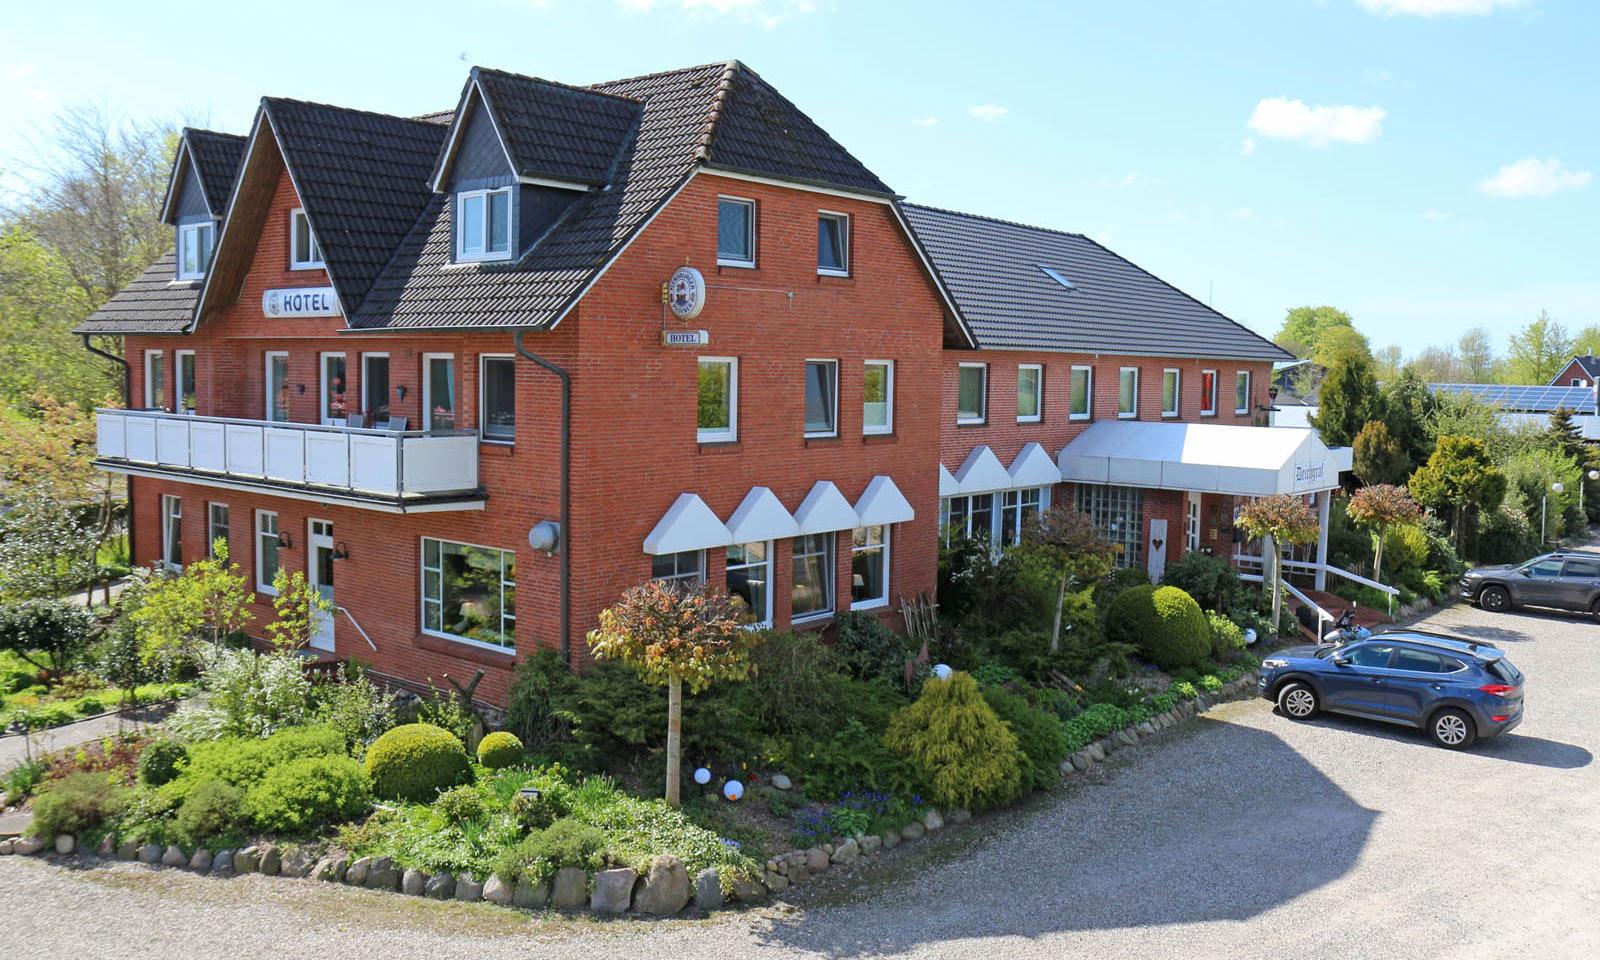 Hotel & Restaurant Deichgraf